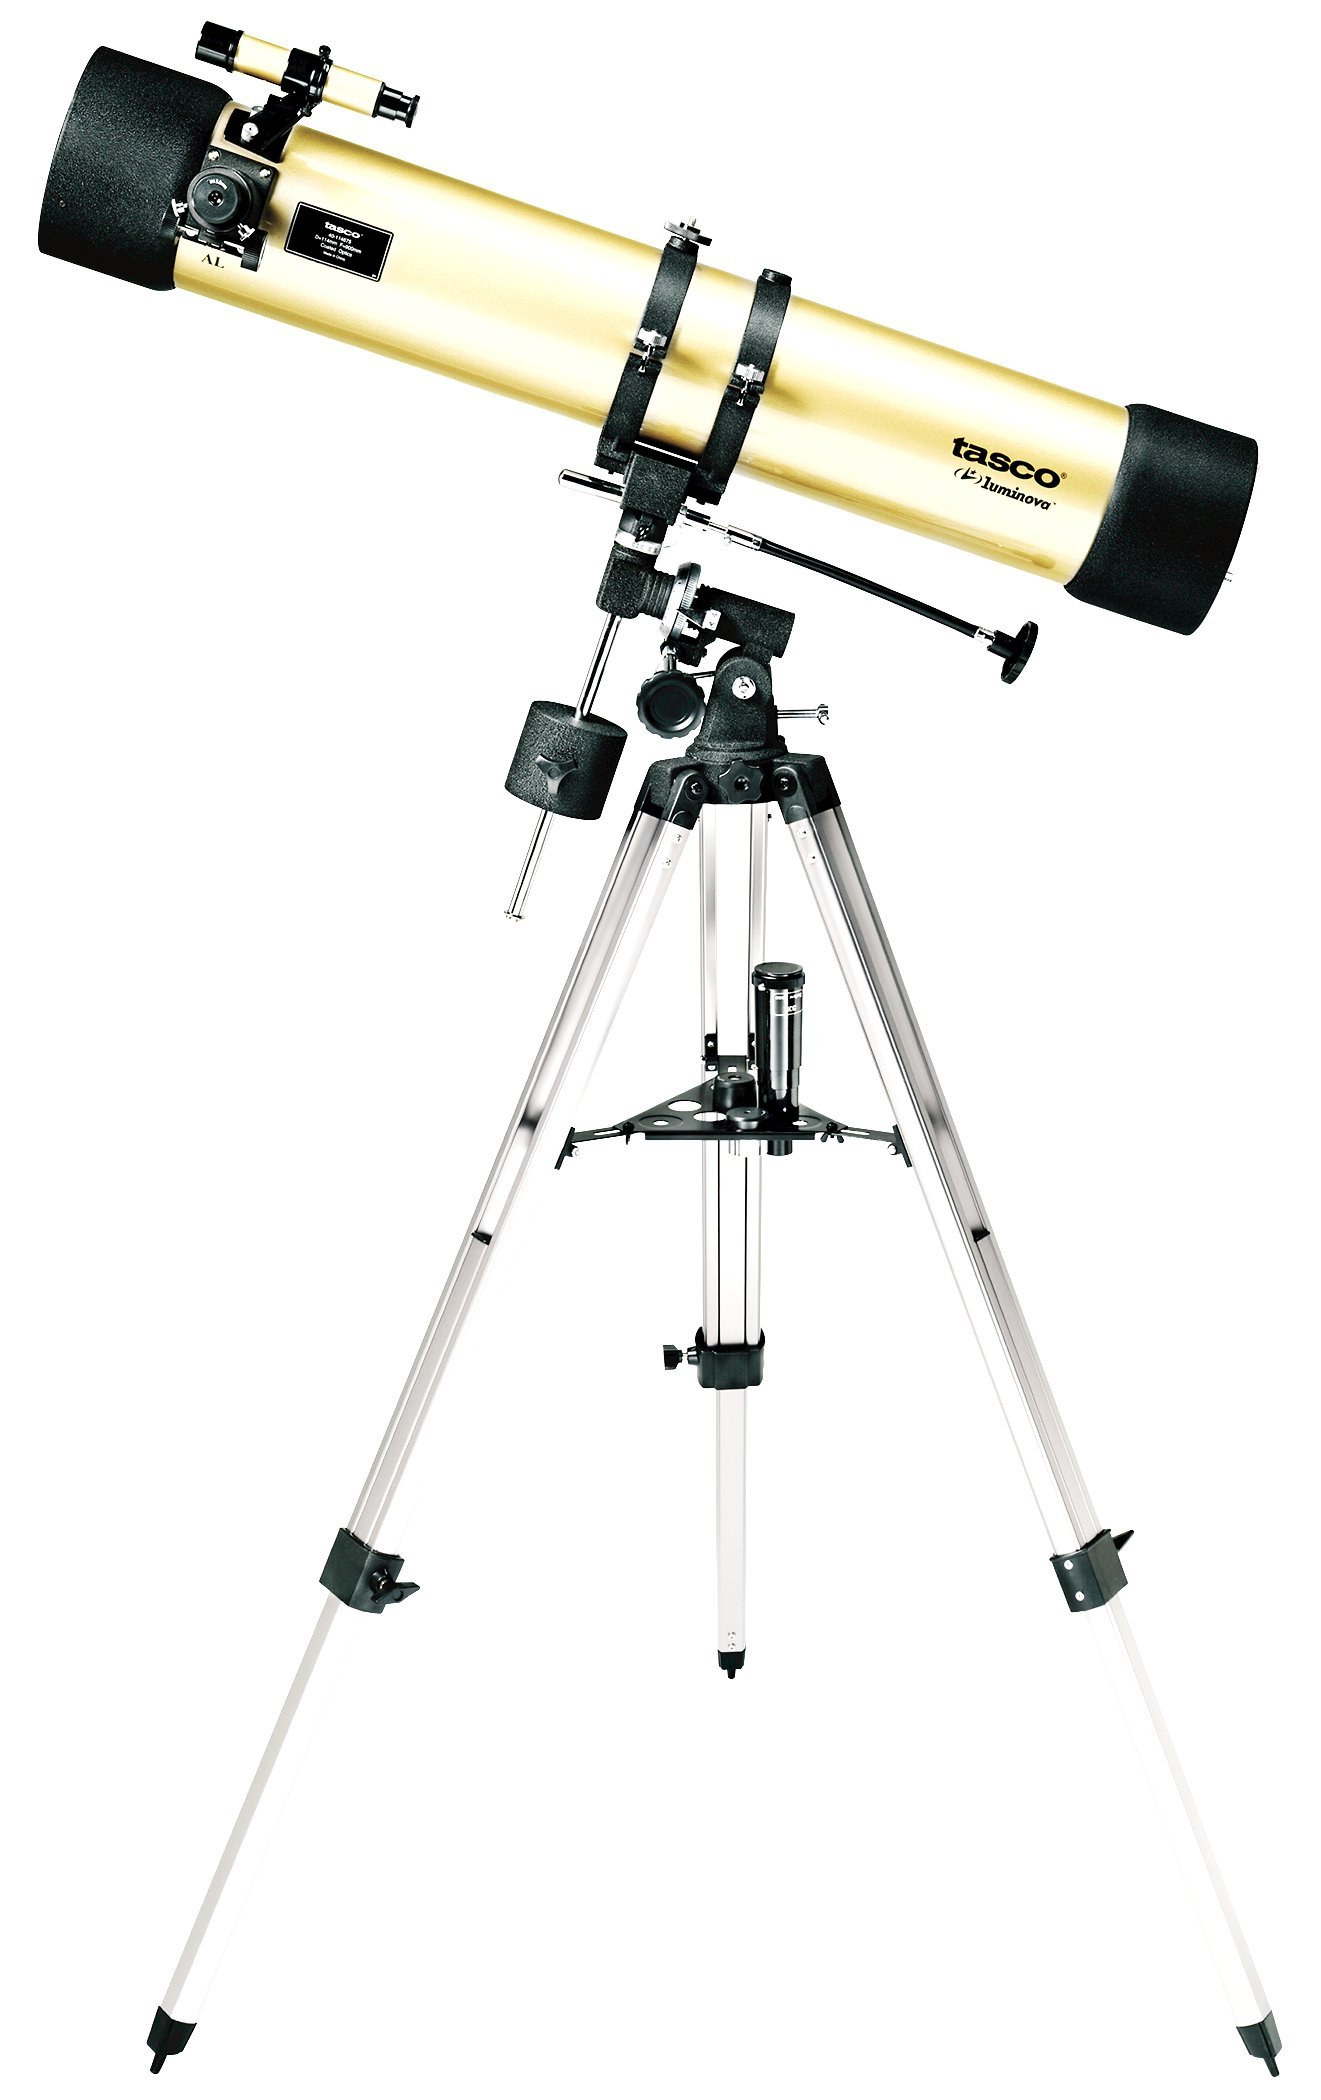 Tasco Luminova 675 x 114mm Reflector Telescope by Bushnell